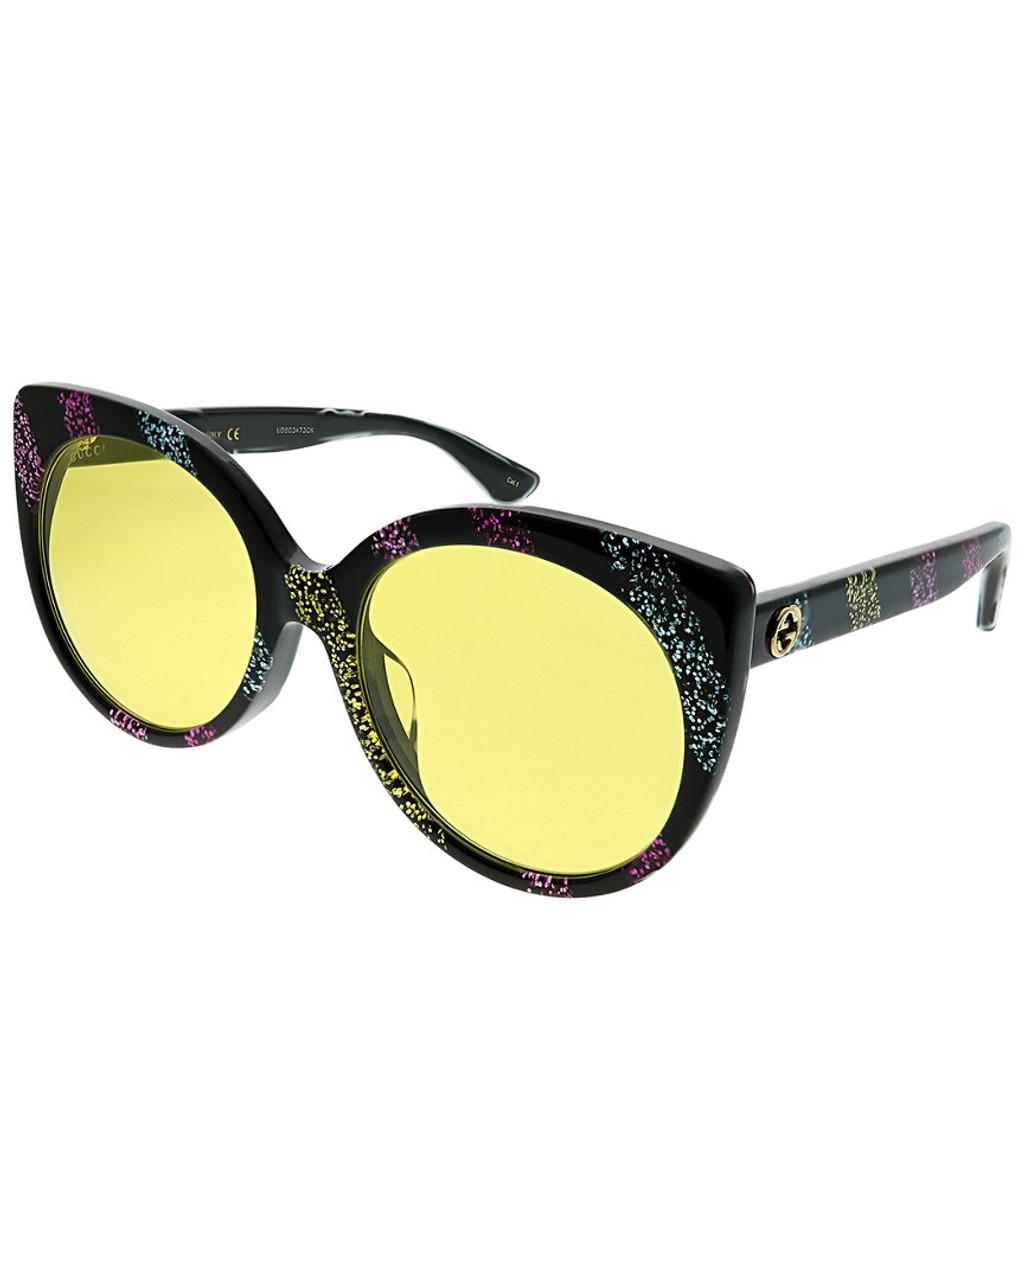 e58f36bcc6d Gucci Women s Cat-eye 57mm Sunglasses~1111932366 - Bon-Ton